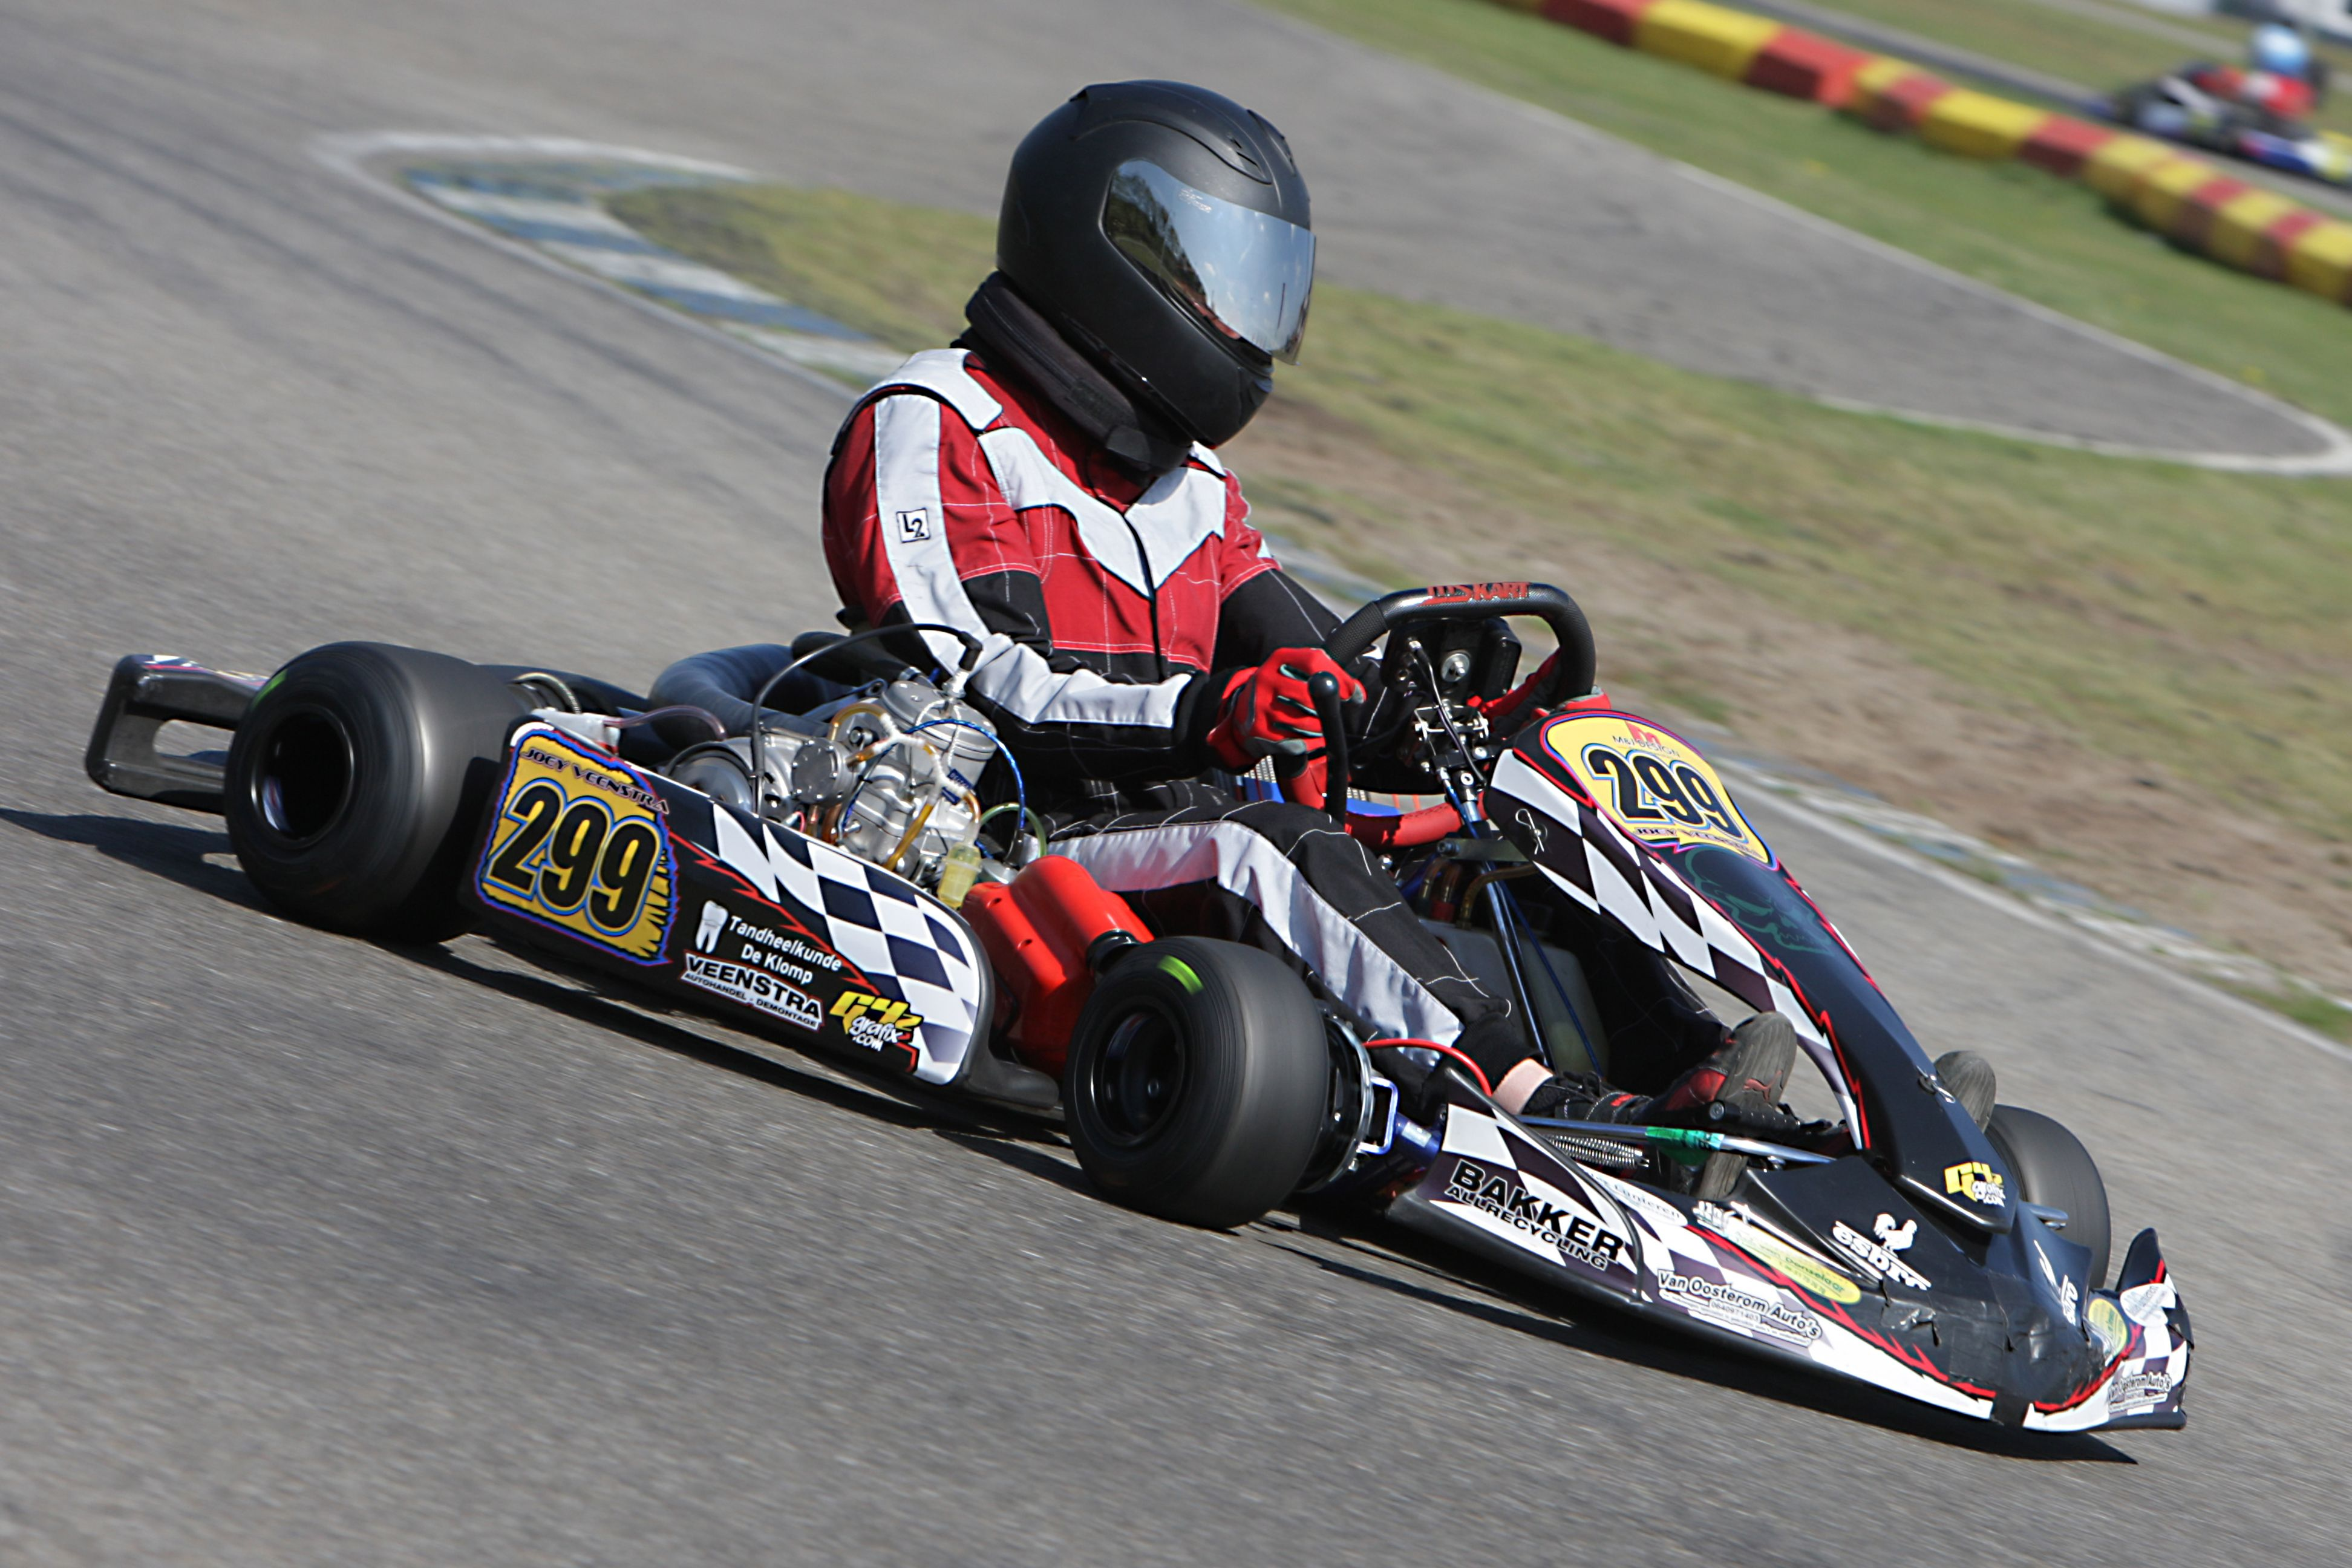 Joey Veenstra 299 Karting Gk4 125cc Schakel Circuit Park Berghem Karting Go Kart Kart Racing